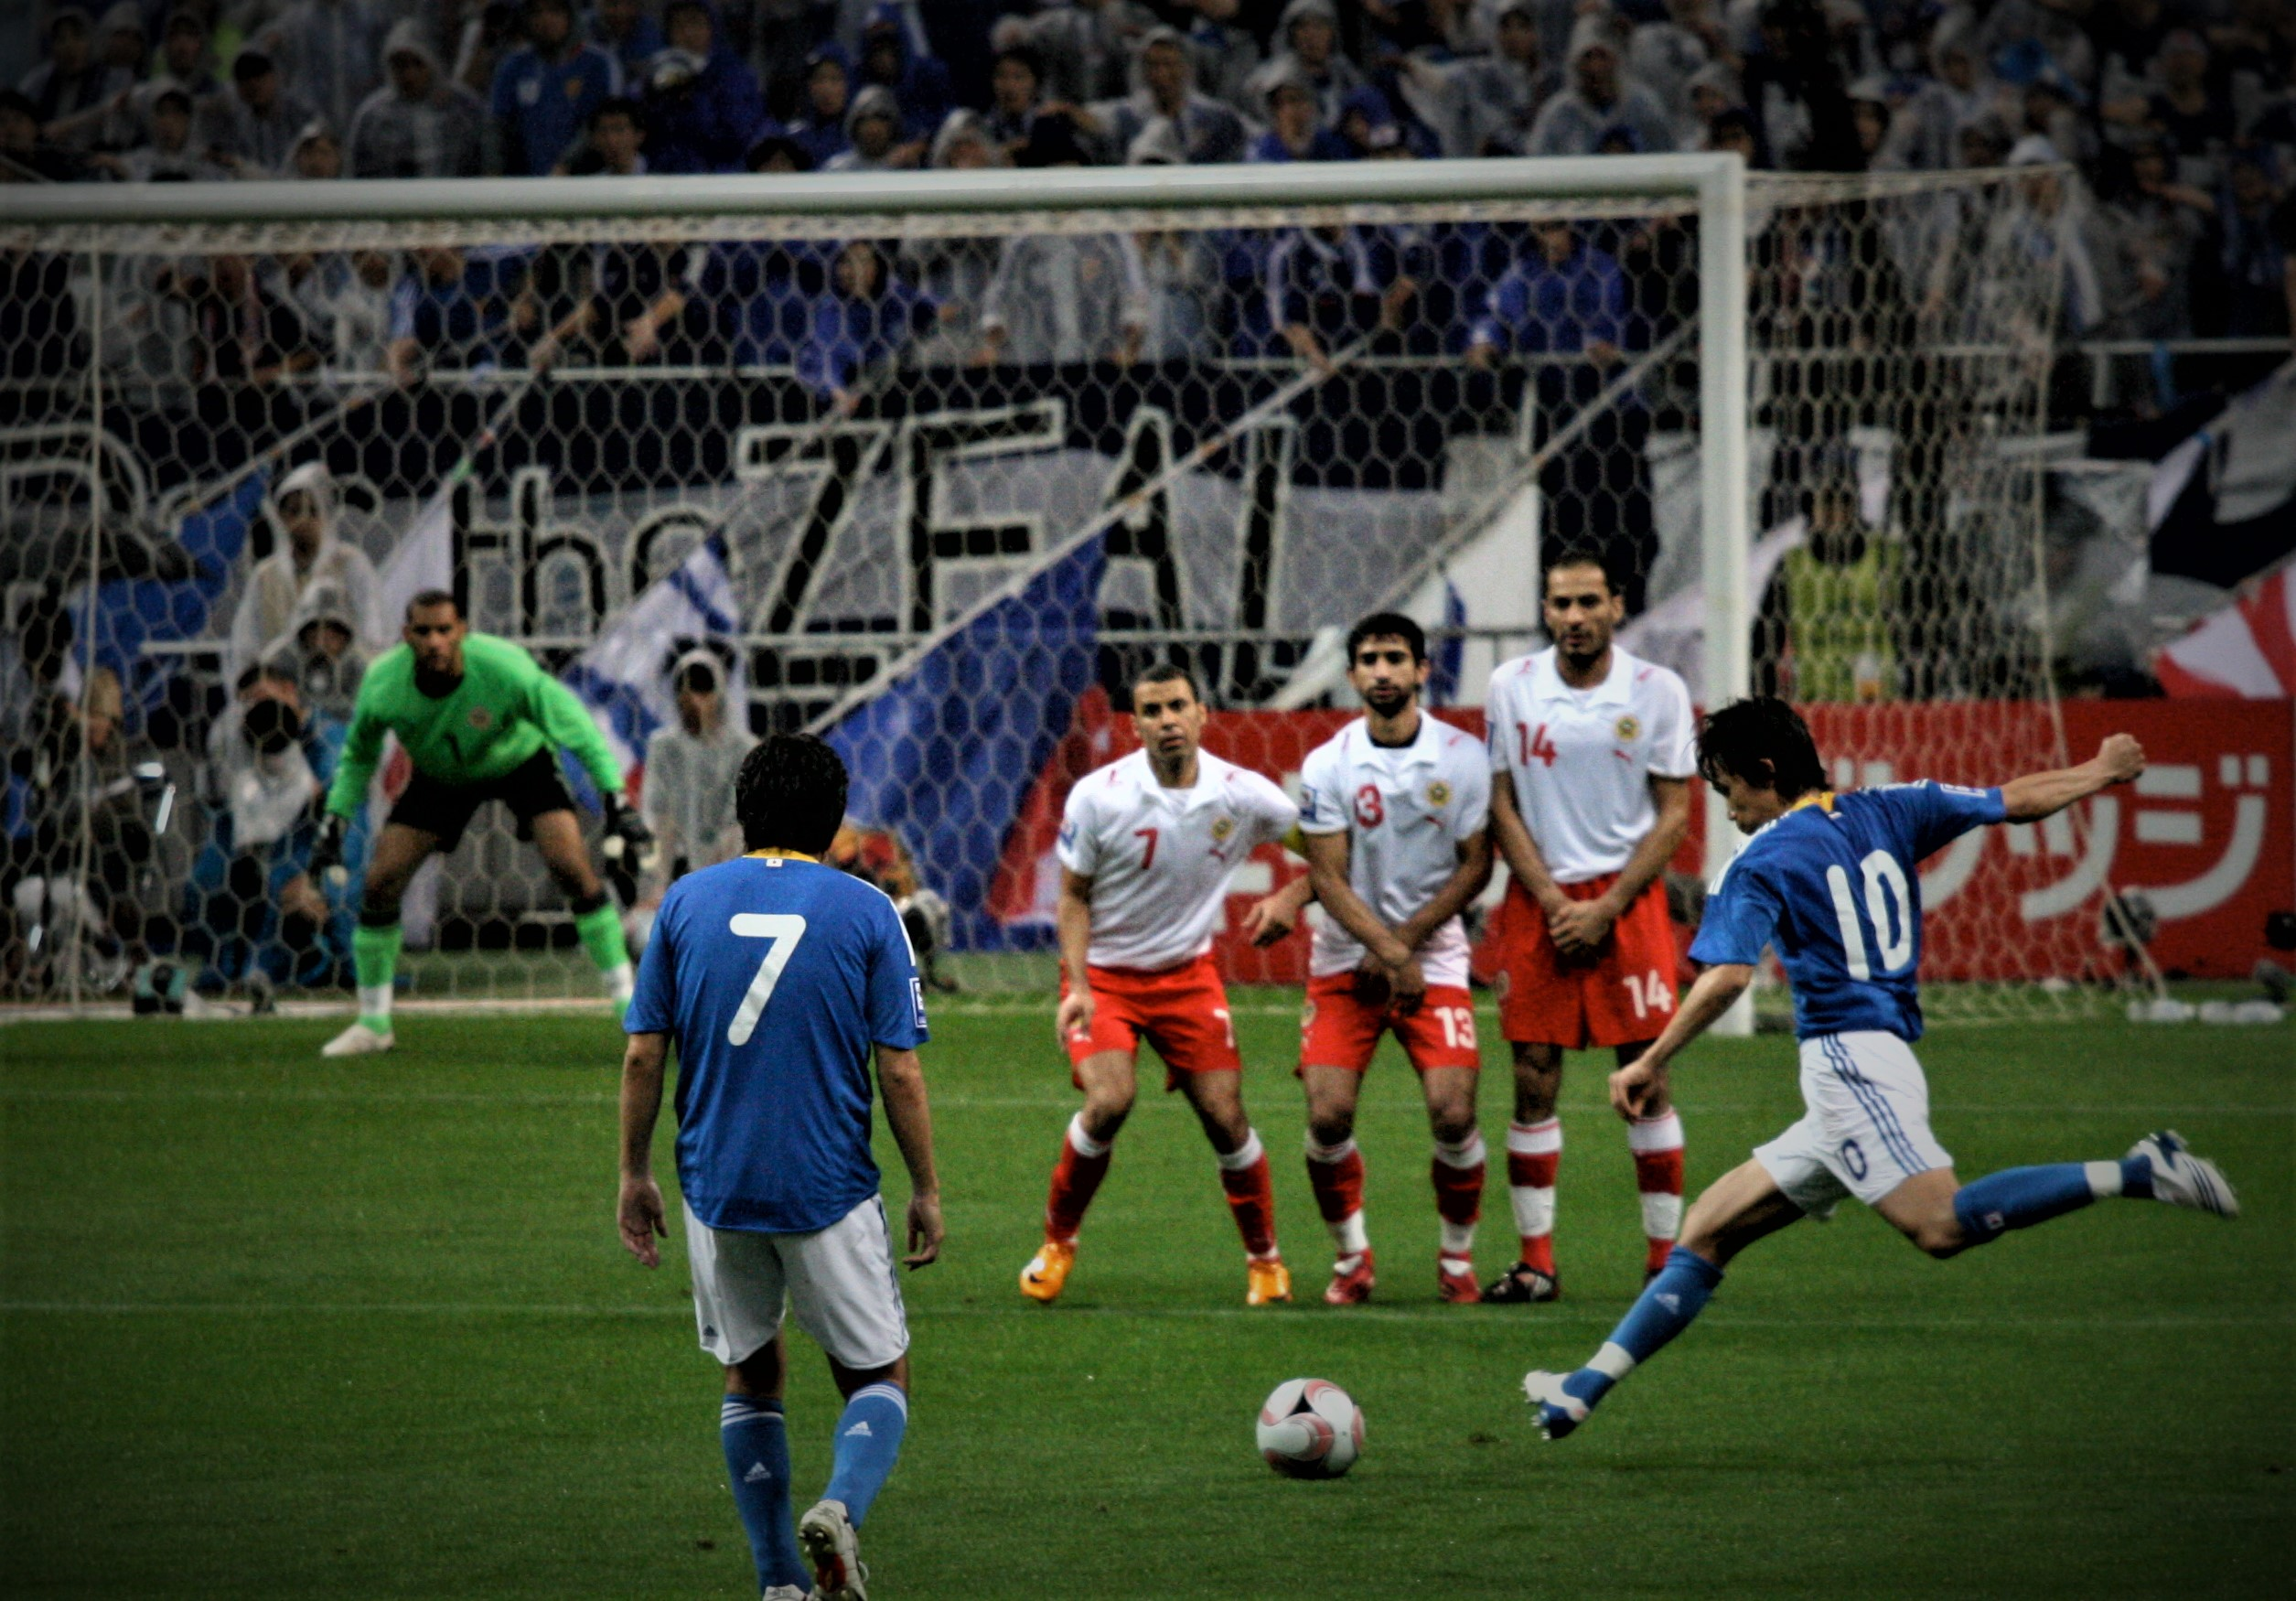 Ketahui Permainan Online Judi Bola Agar Mudah Main